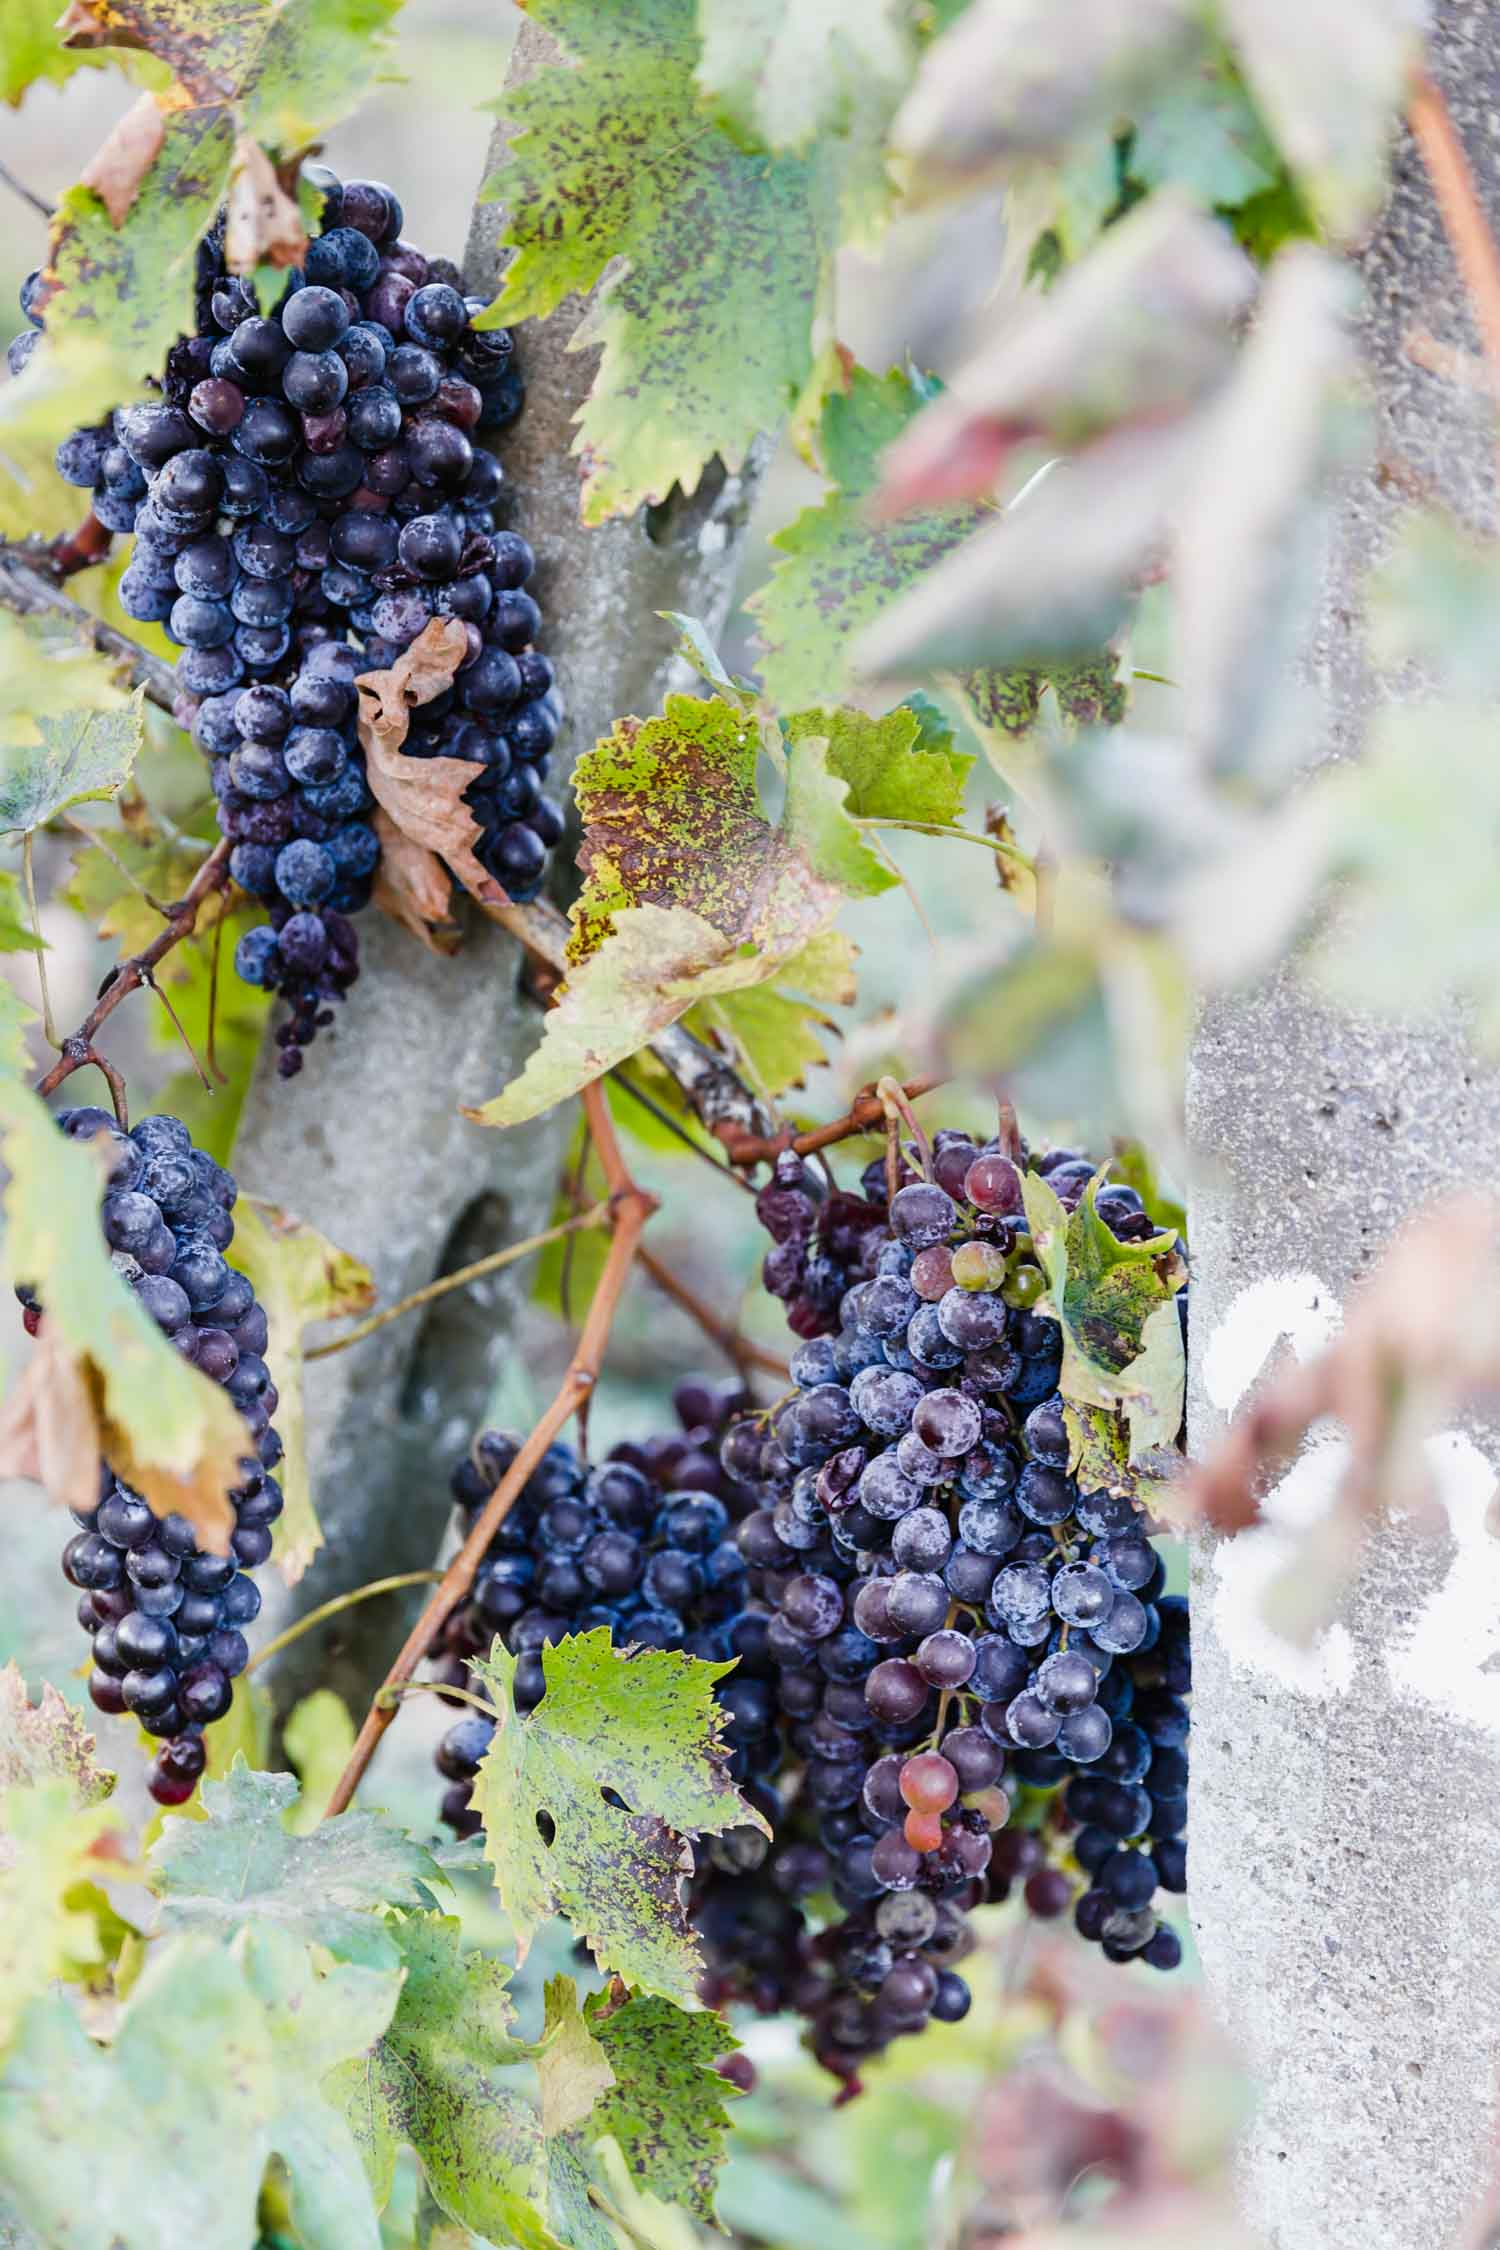 October, the end of grape season at i pini, the organic & vegan farmhouse in Tuscany. The grapes are grown for their own label, all organic wines. #tuscany #travel #italy #italianfarmhouse #organicwine #organicgrapes #vineyards #italyinautumn #veganrestaurant #vegantravel #italytravel #veganitaly #vegantuscany #veganhotel #ecotourism #organichotel #veganhotel #veganretreat #veganbedandbreakfast #sangimignano